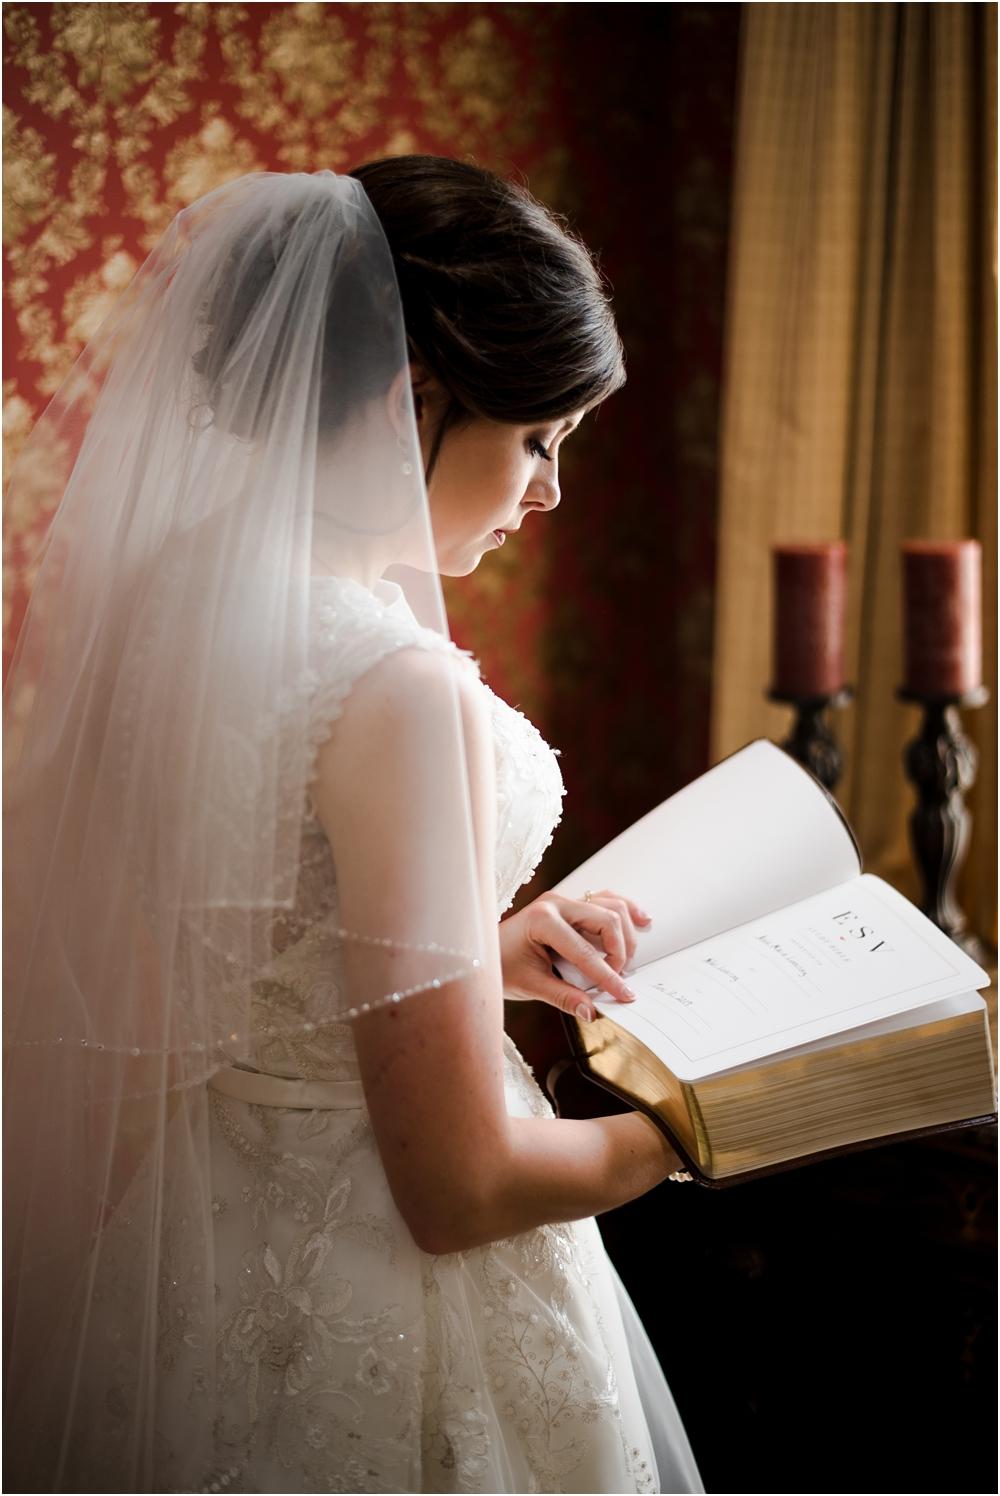 marianna-florida-wedding-photographer-kiersten-grant-30.jpg